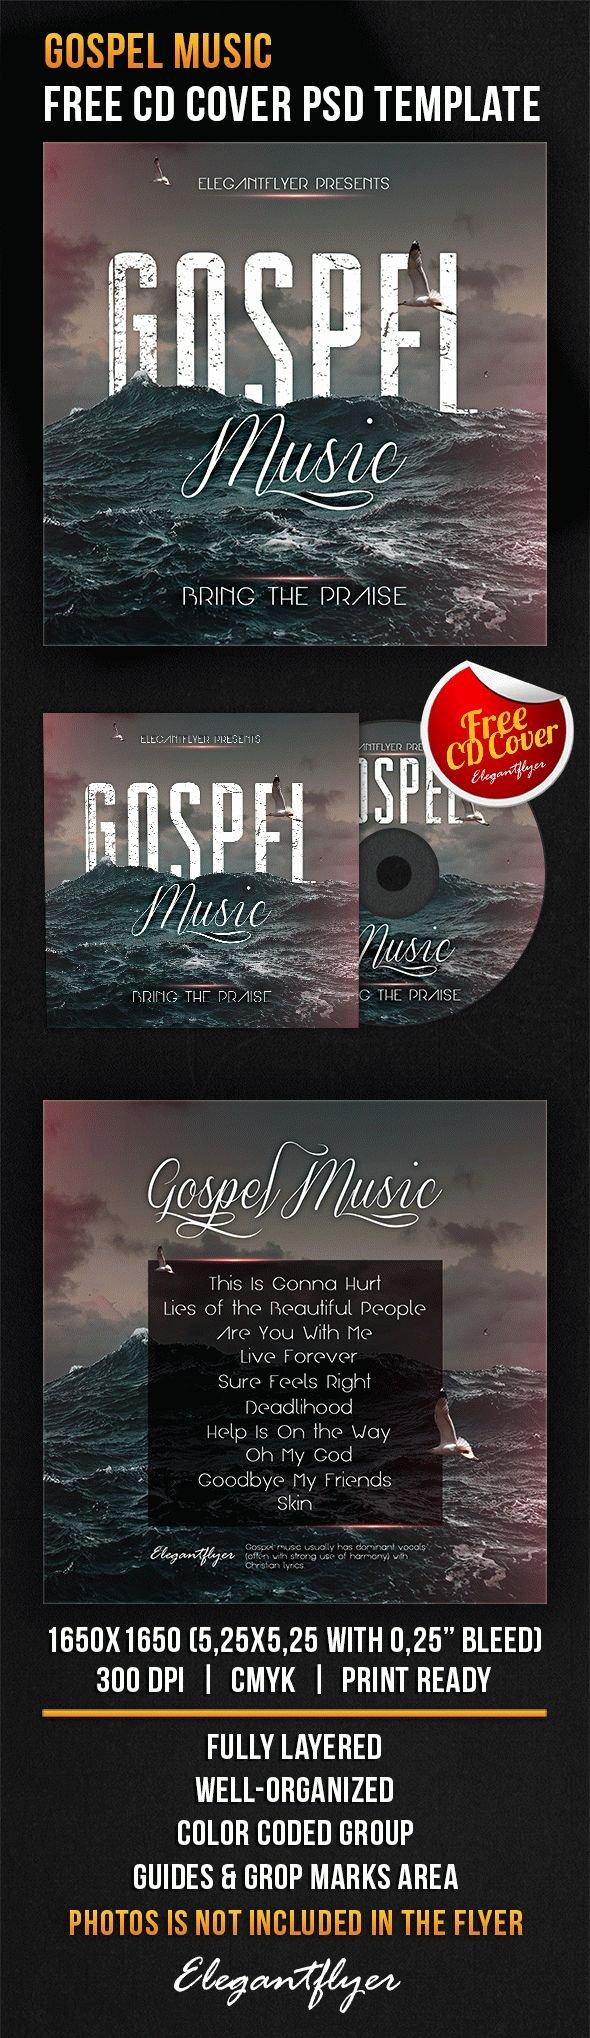 gospel music free cd cover psd template